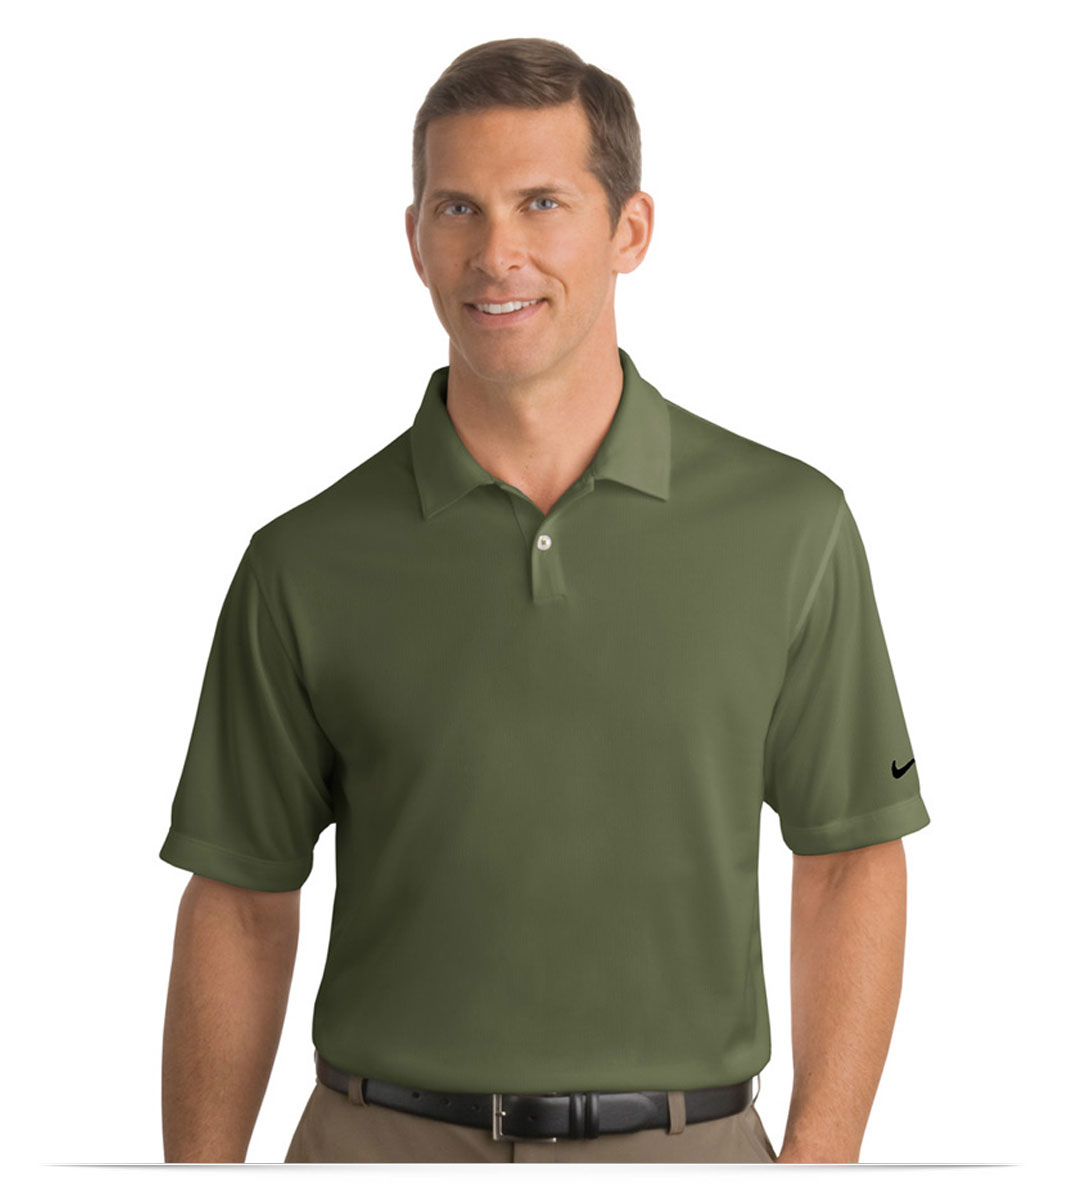 Design embroidered custom nike golf shirt online at for Custom printed golf shirts